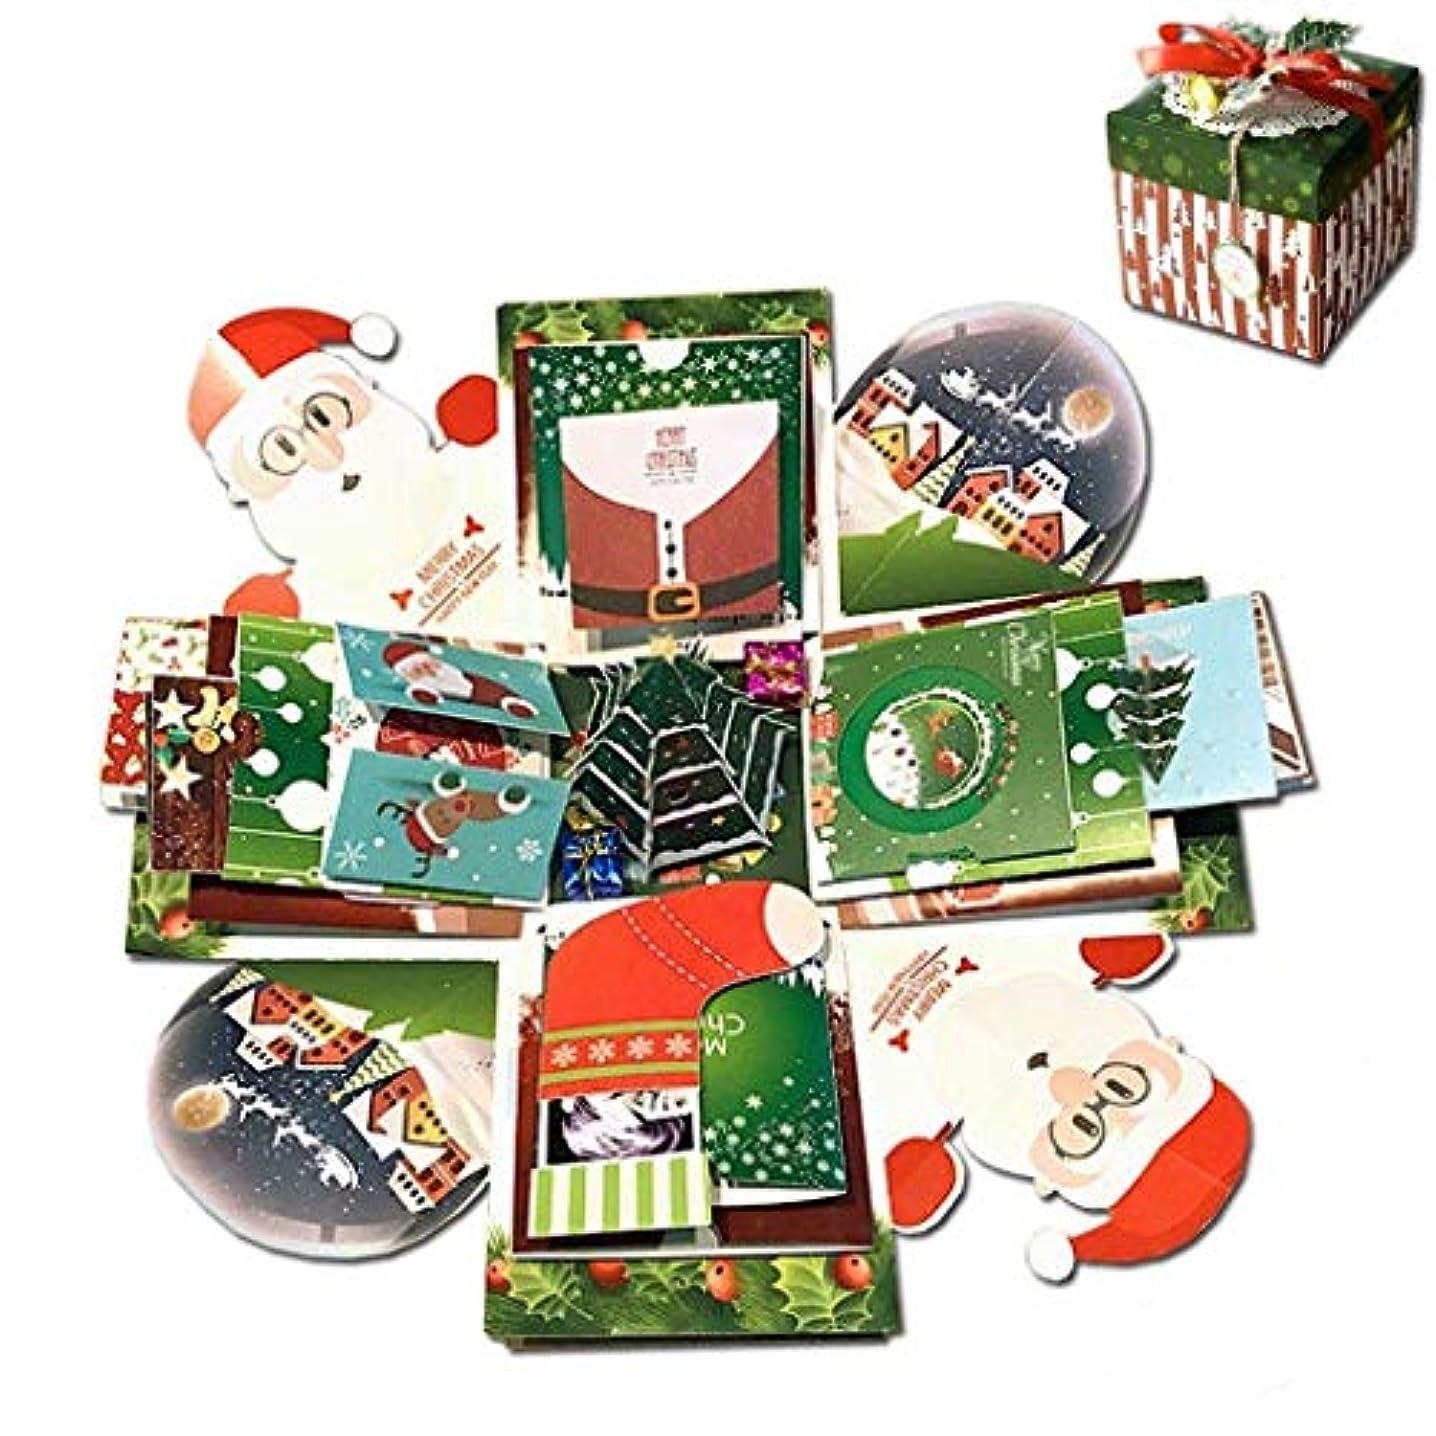 Seenew Creative Explosion Box DIY Handmade Photo Album Scrapbooking Gift Box for Christmas and Surprise Box 17''x17''